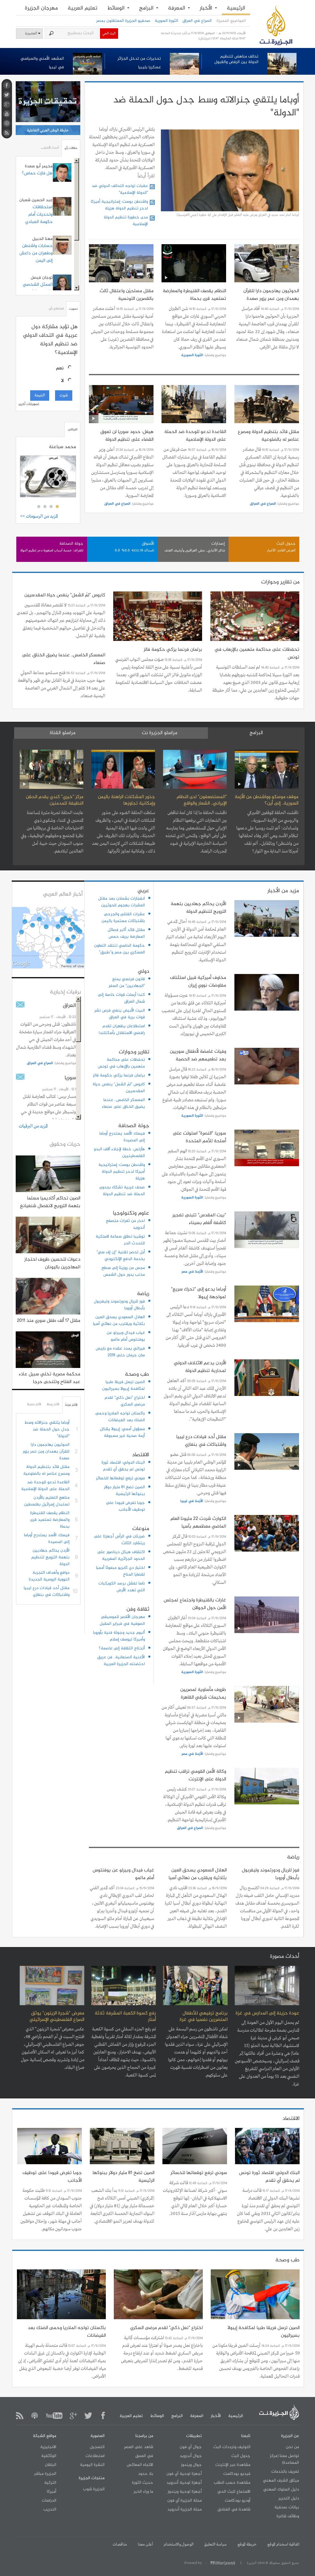 Al Jazeera at Wednesday Sept. 17, 2014, 1:11 p.m. UTC